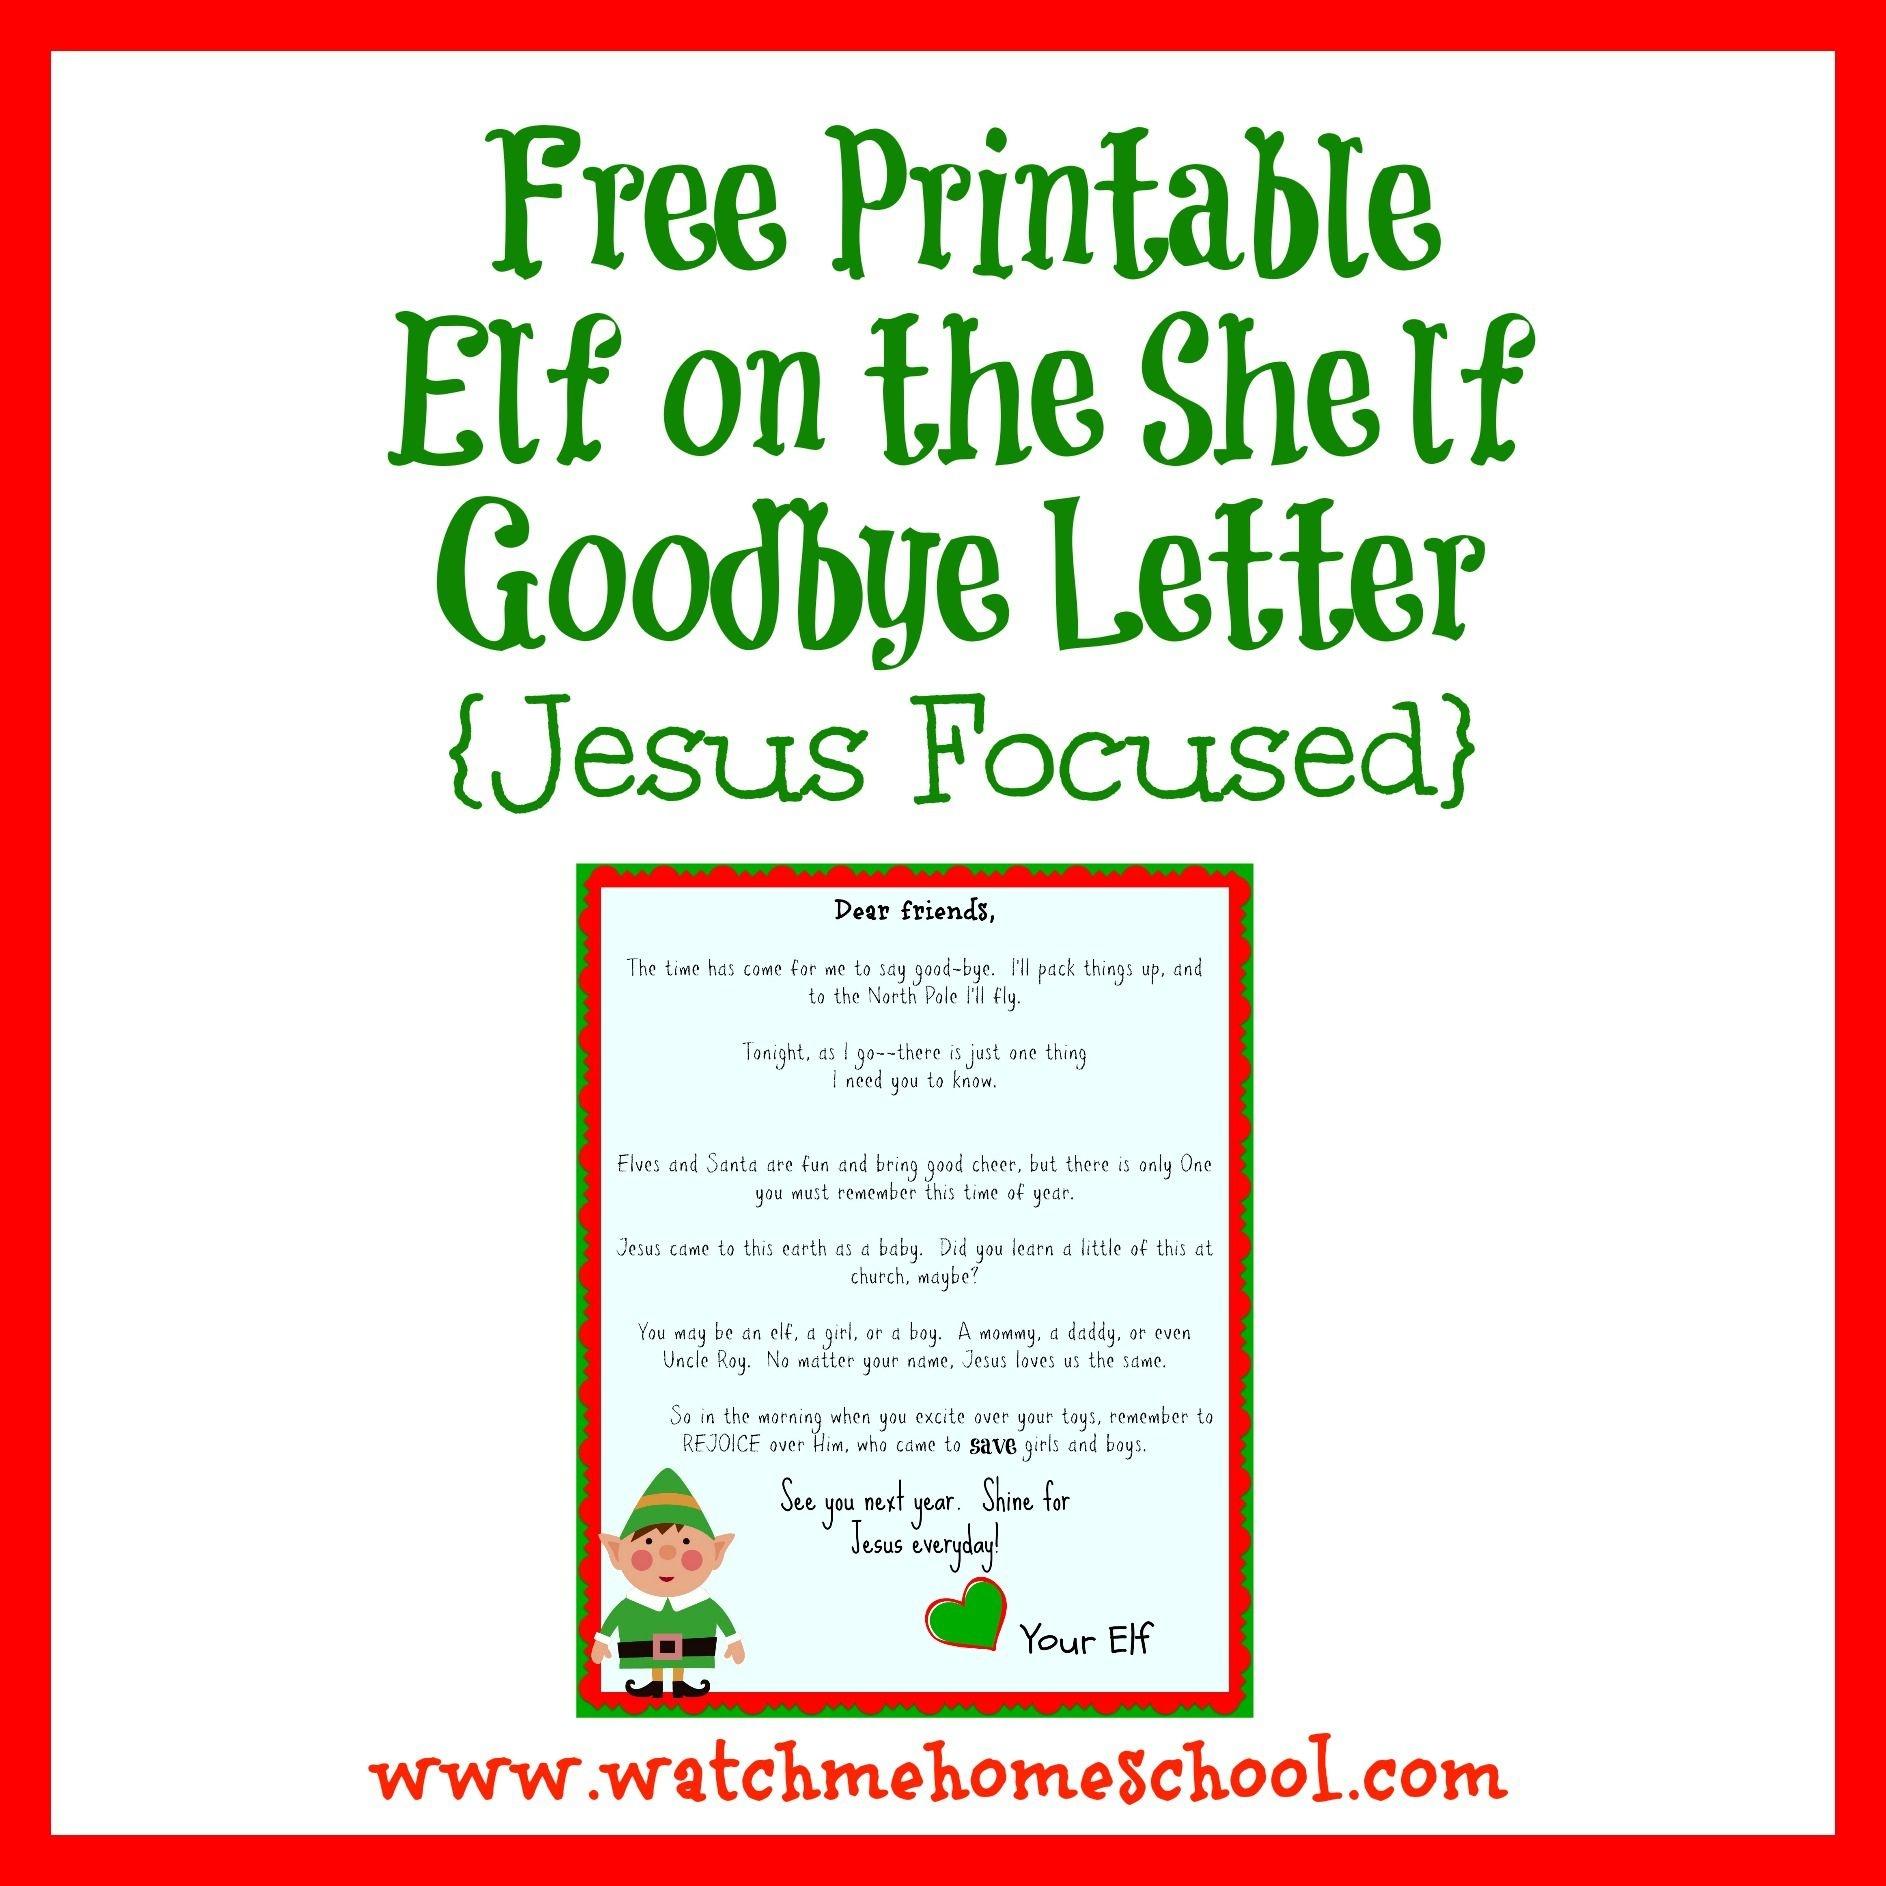 Elf On The Shelf Farewell Letter Printable | Elf On The Shelf | Elf - Elf On The Shelf Goodbye Letter Free Printable